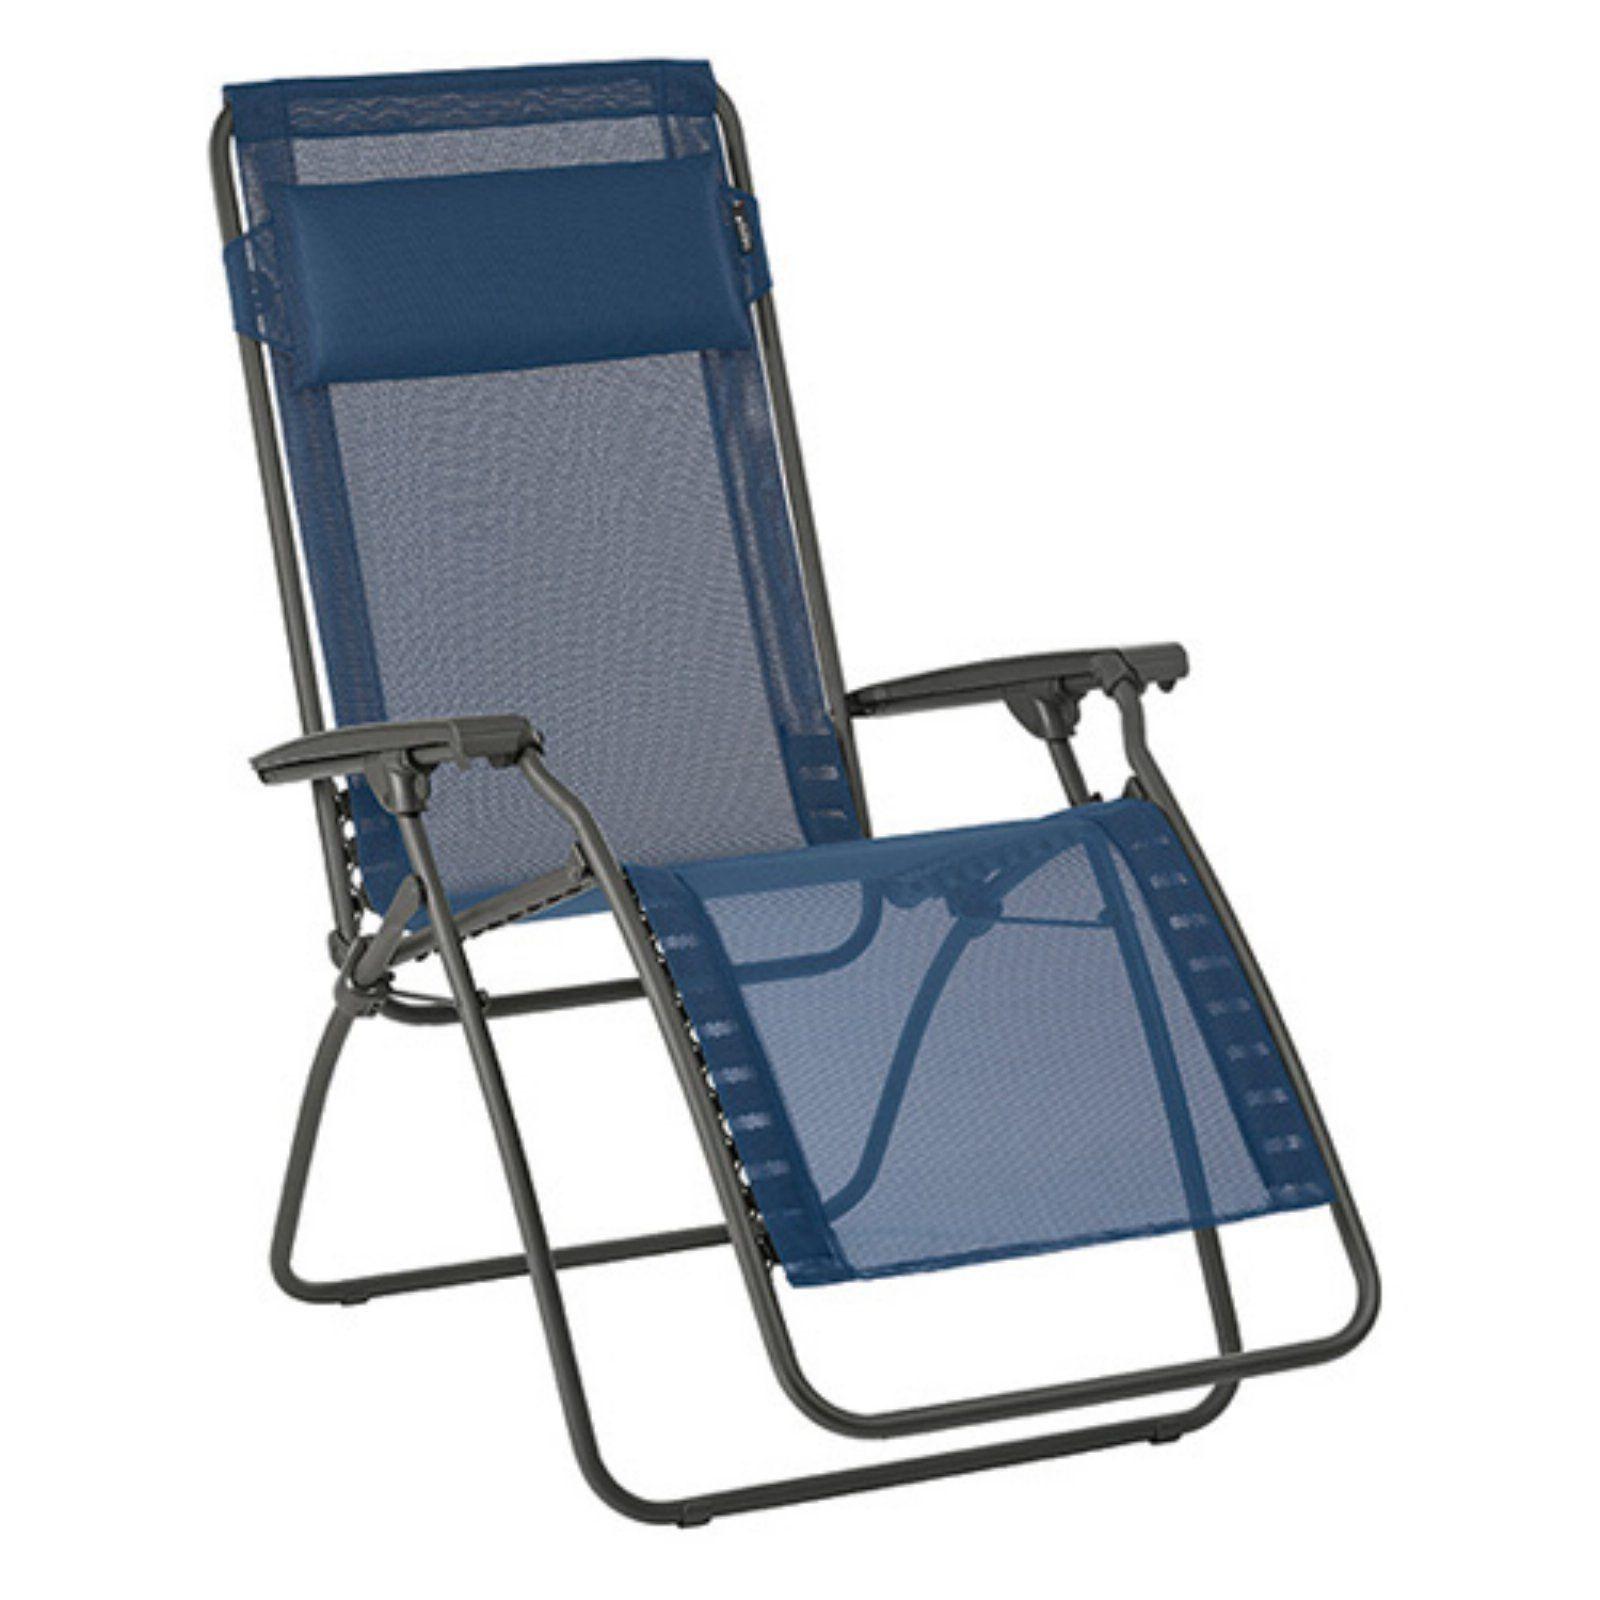 Outdoor Lafuma R Clip Reclining Zero Gravity Chair Siegel 2020 Relaxliege Campingstuhl Sonnenliege